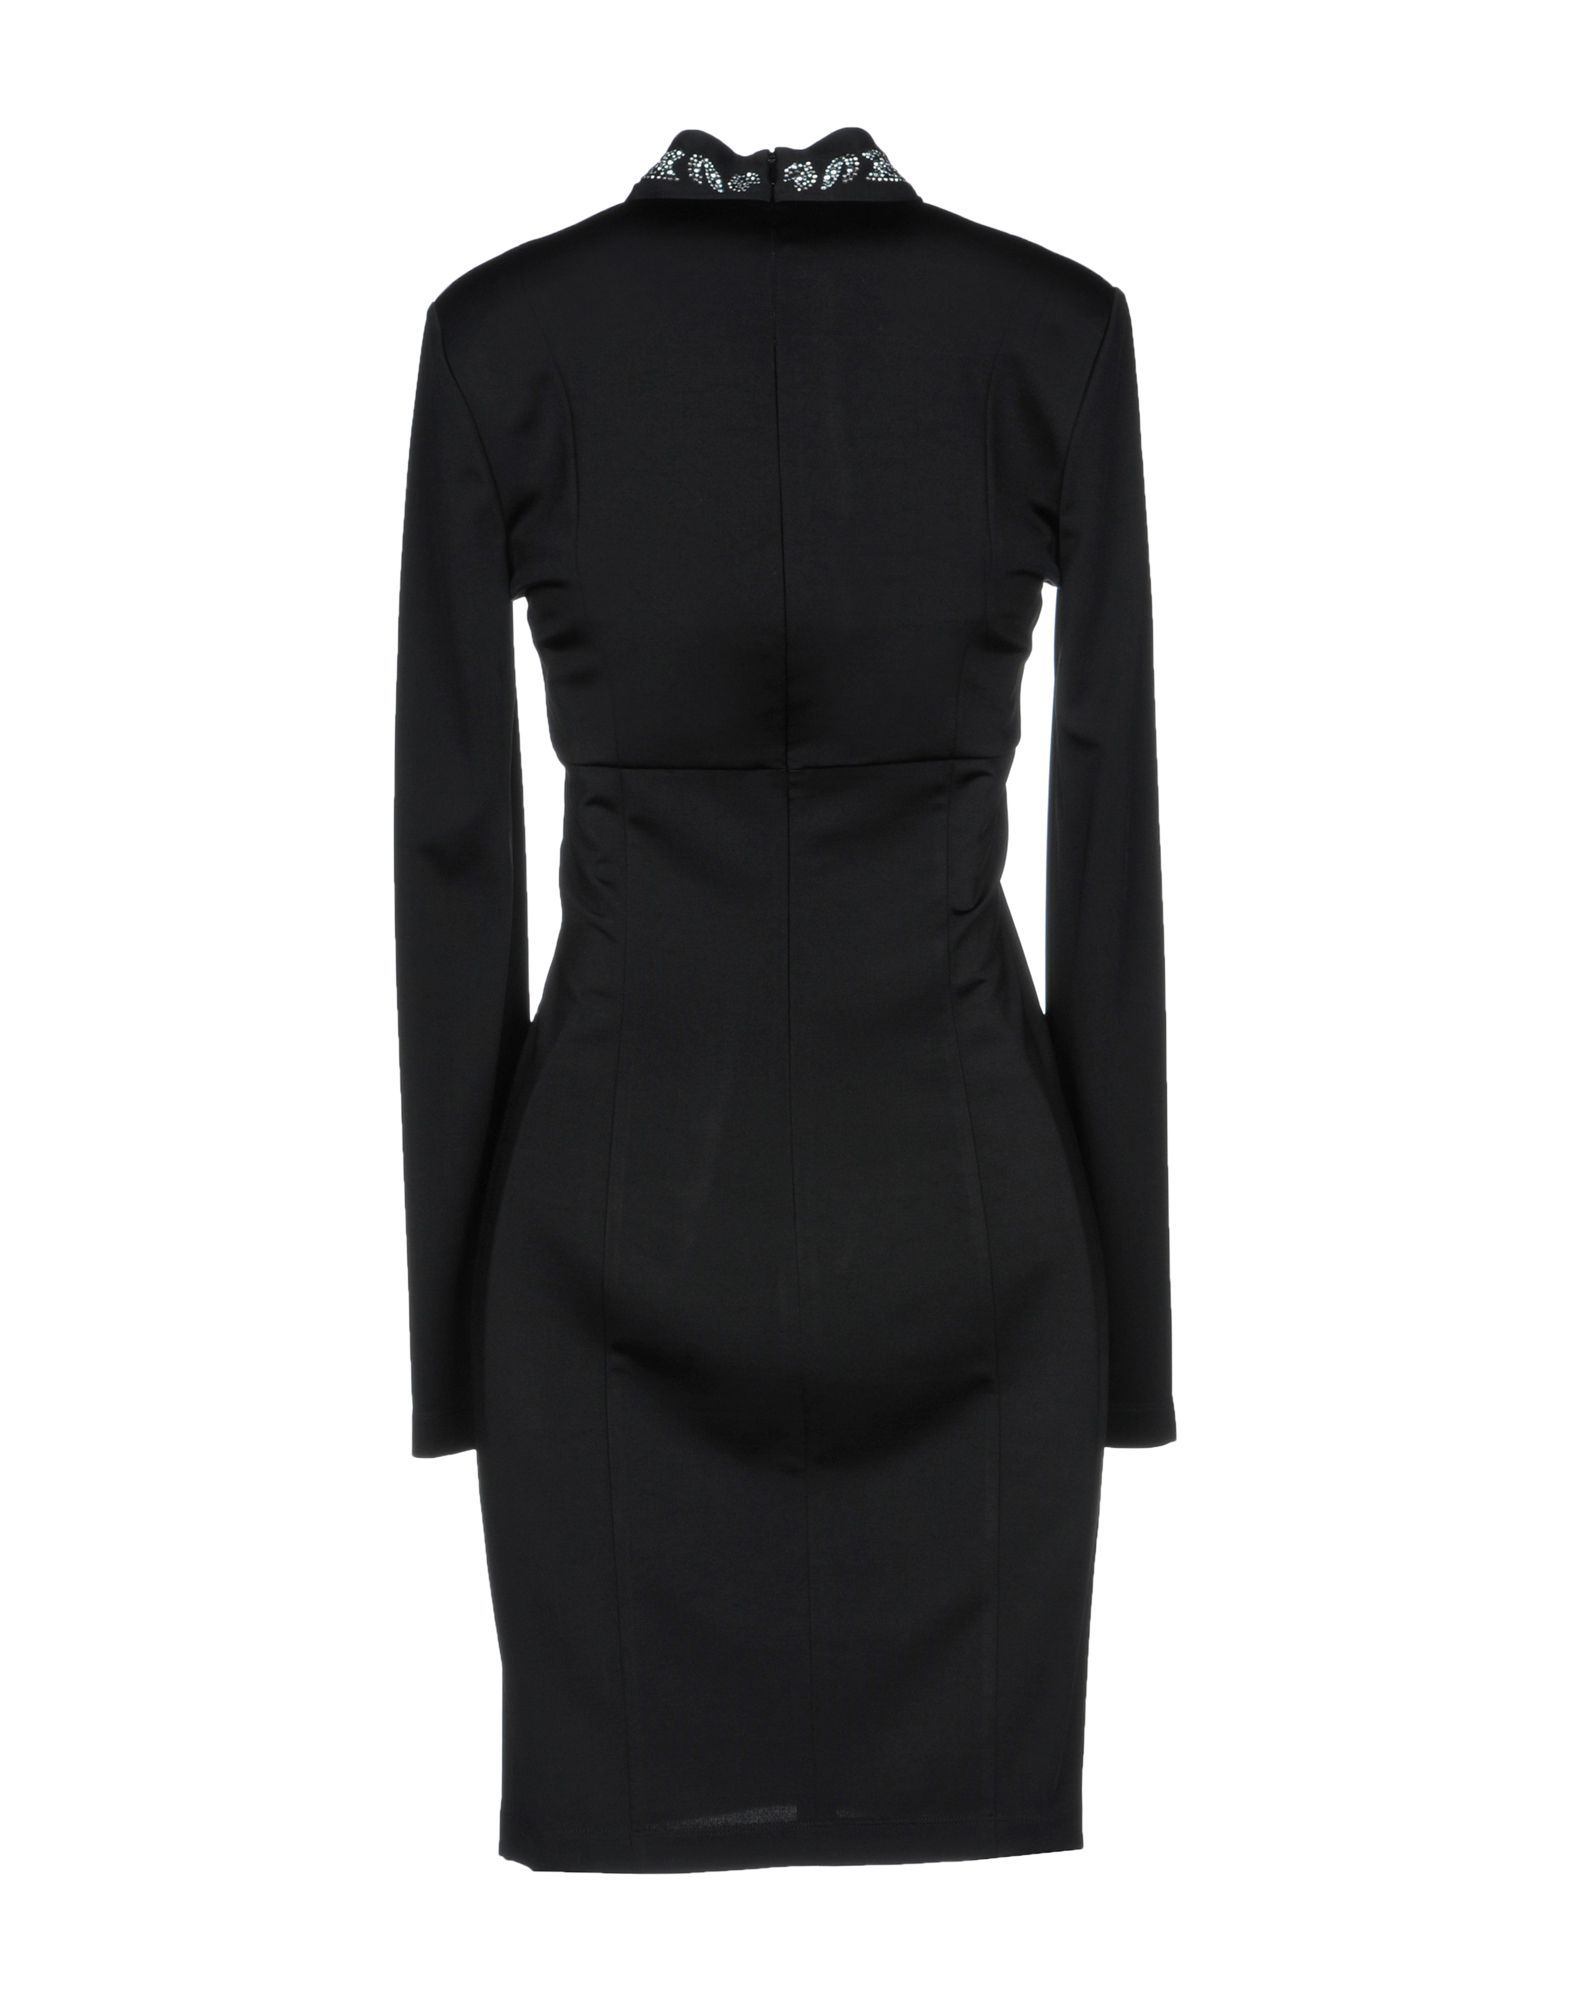 Just Cavalli Black Long Sleeve Dress